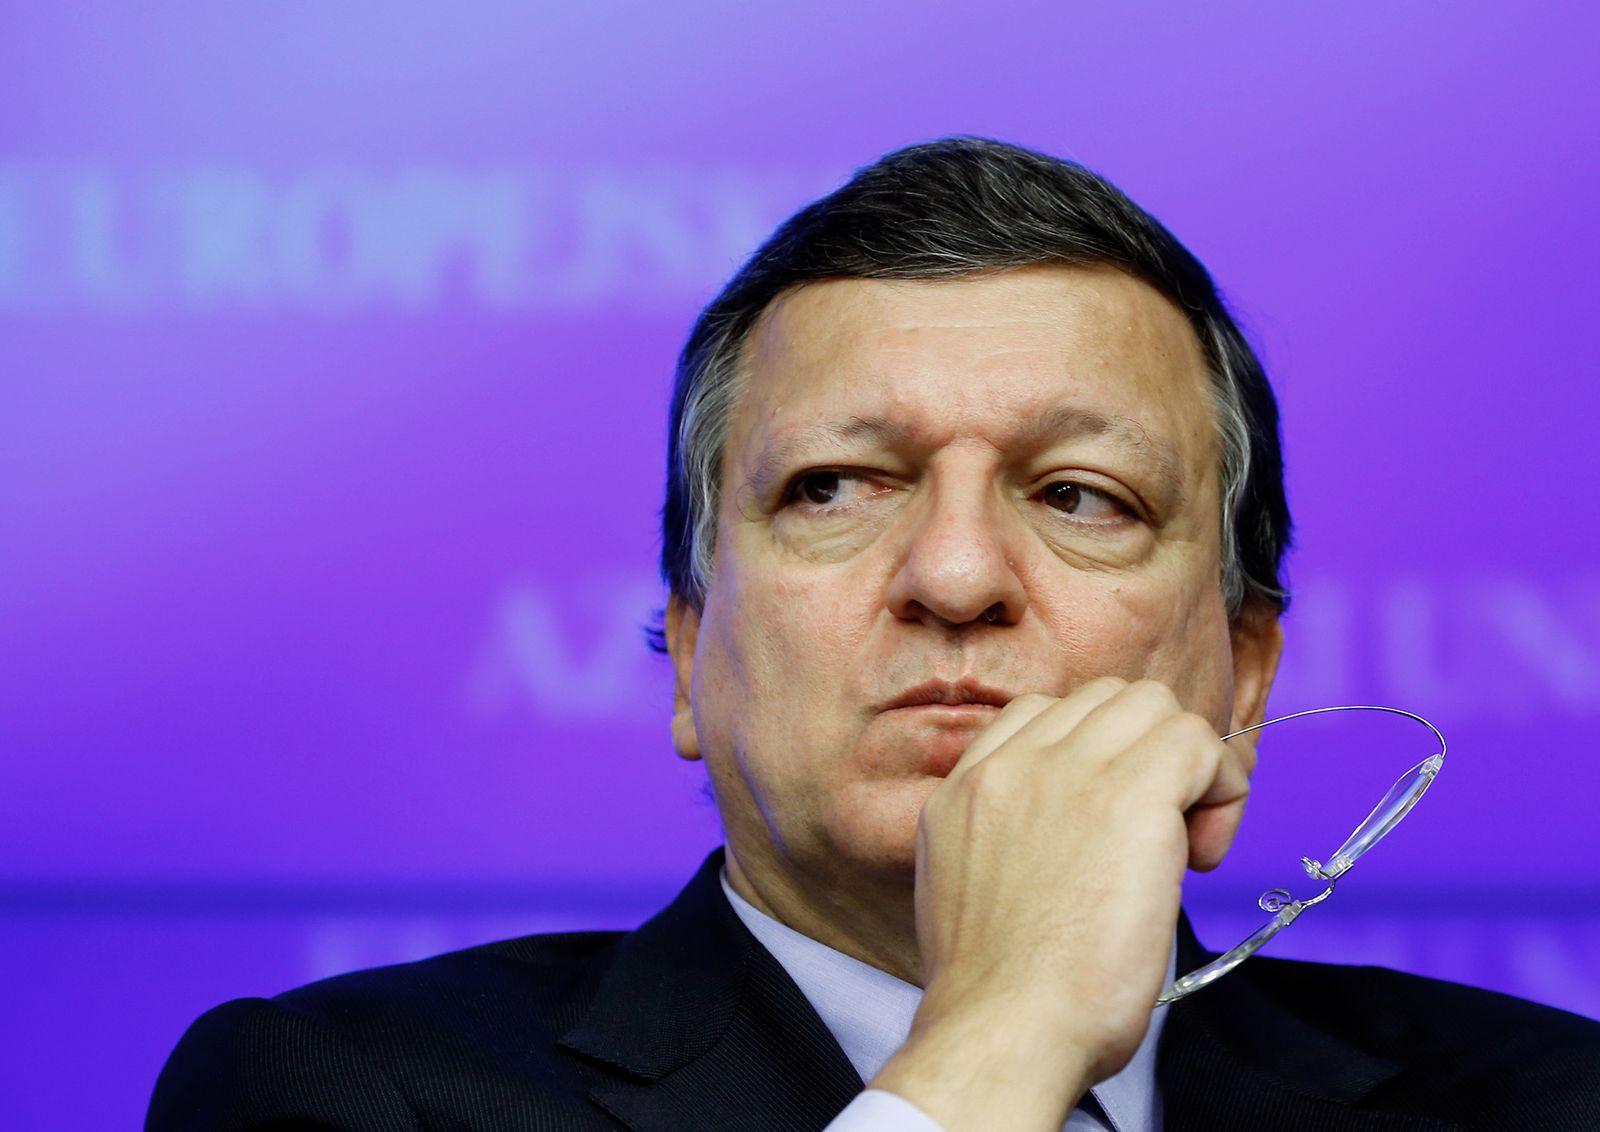 Europäische Kommission/ Jose Manuel Barroso